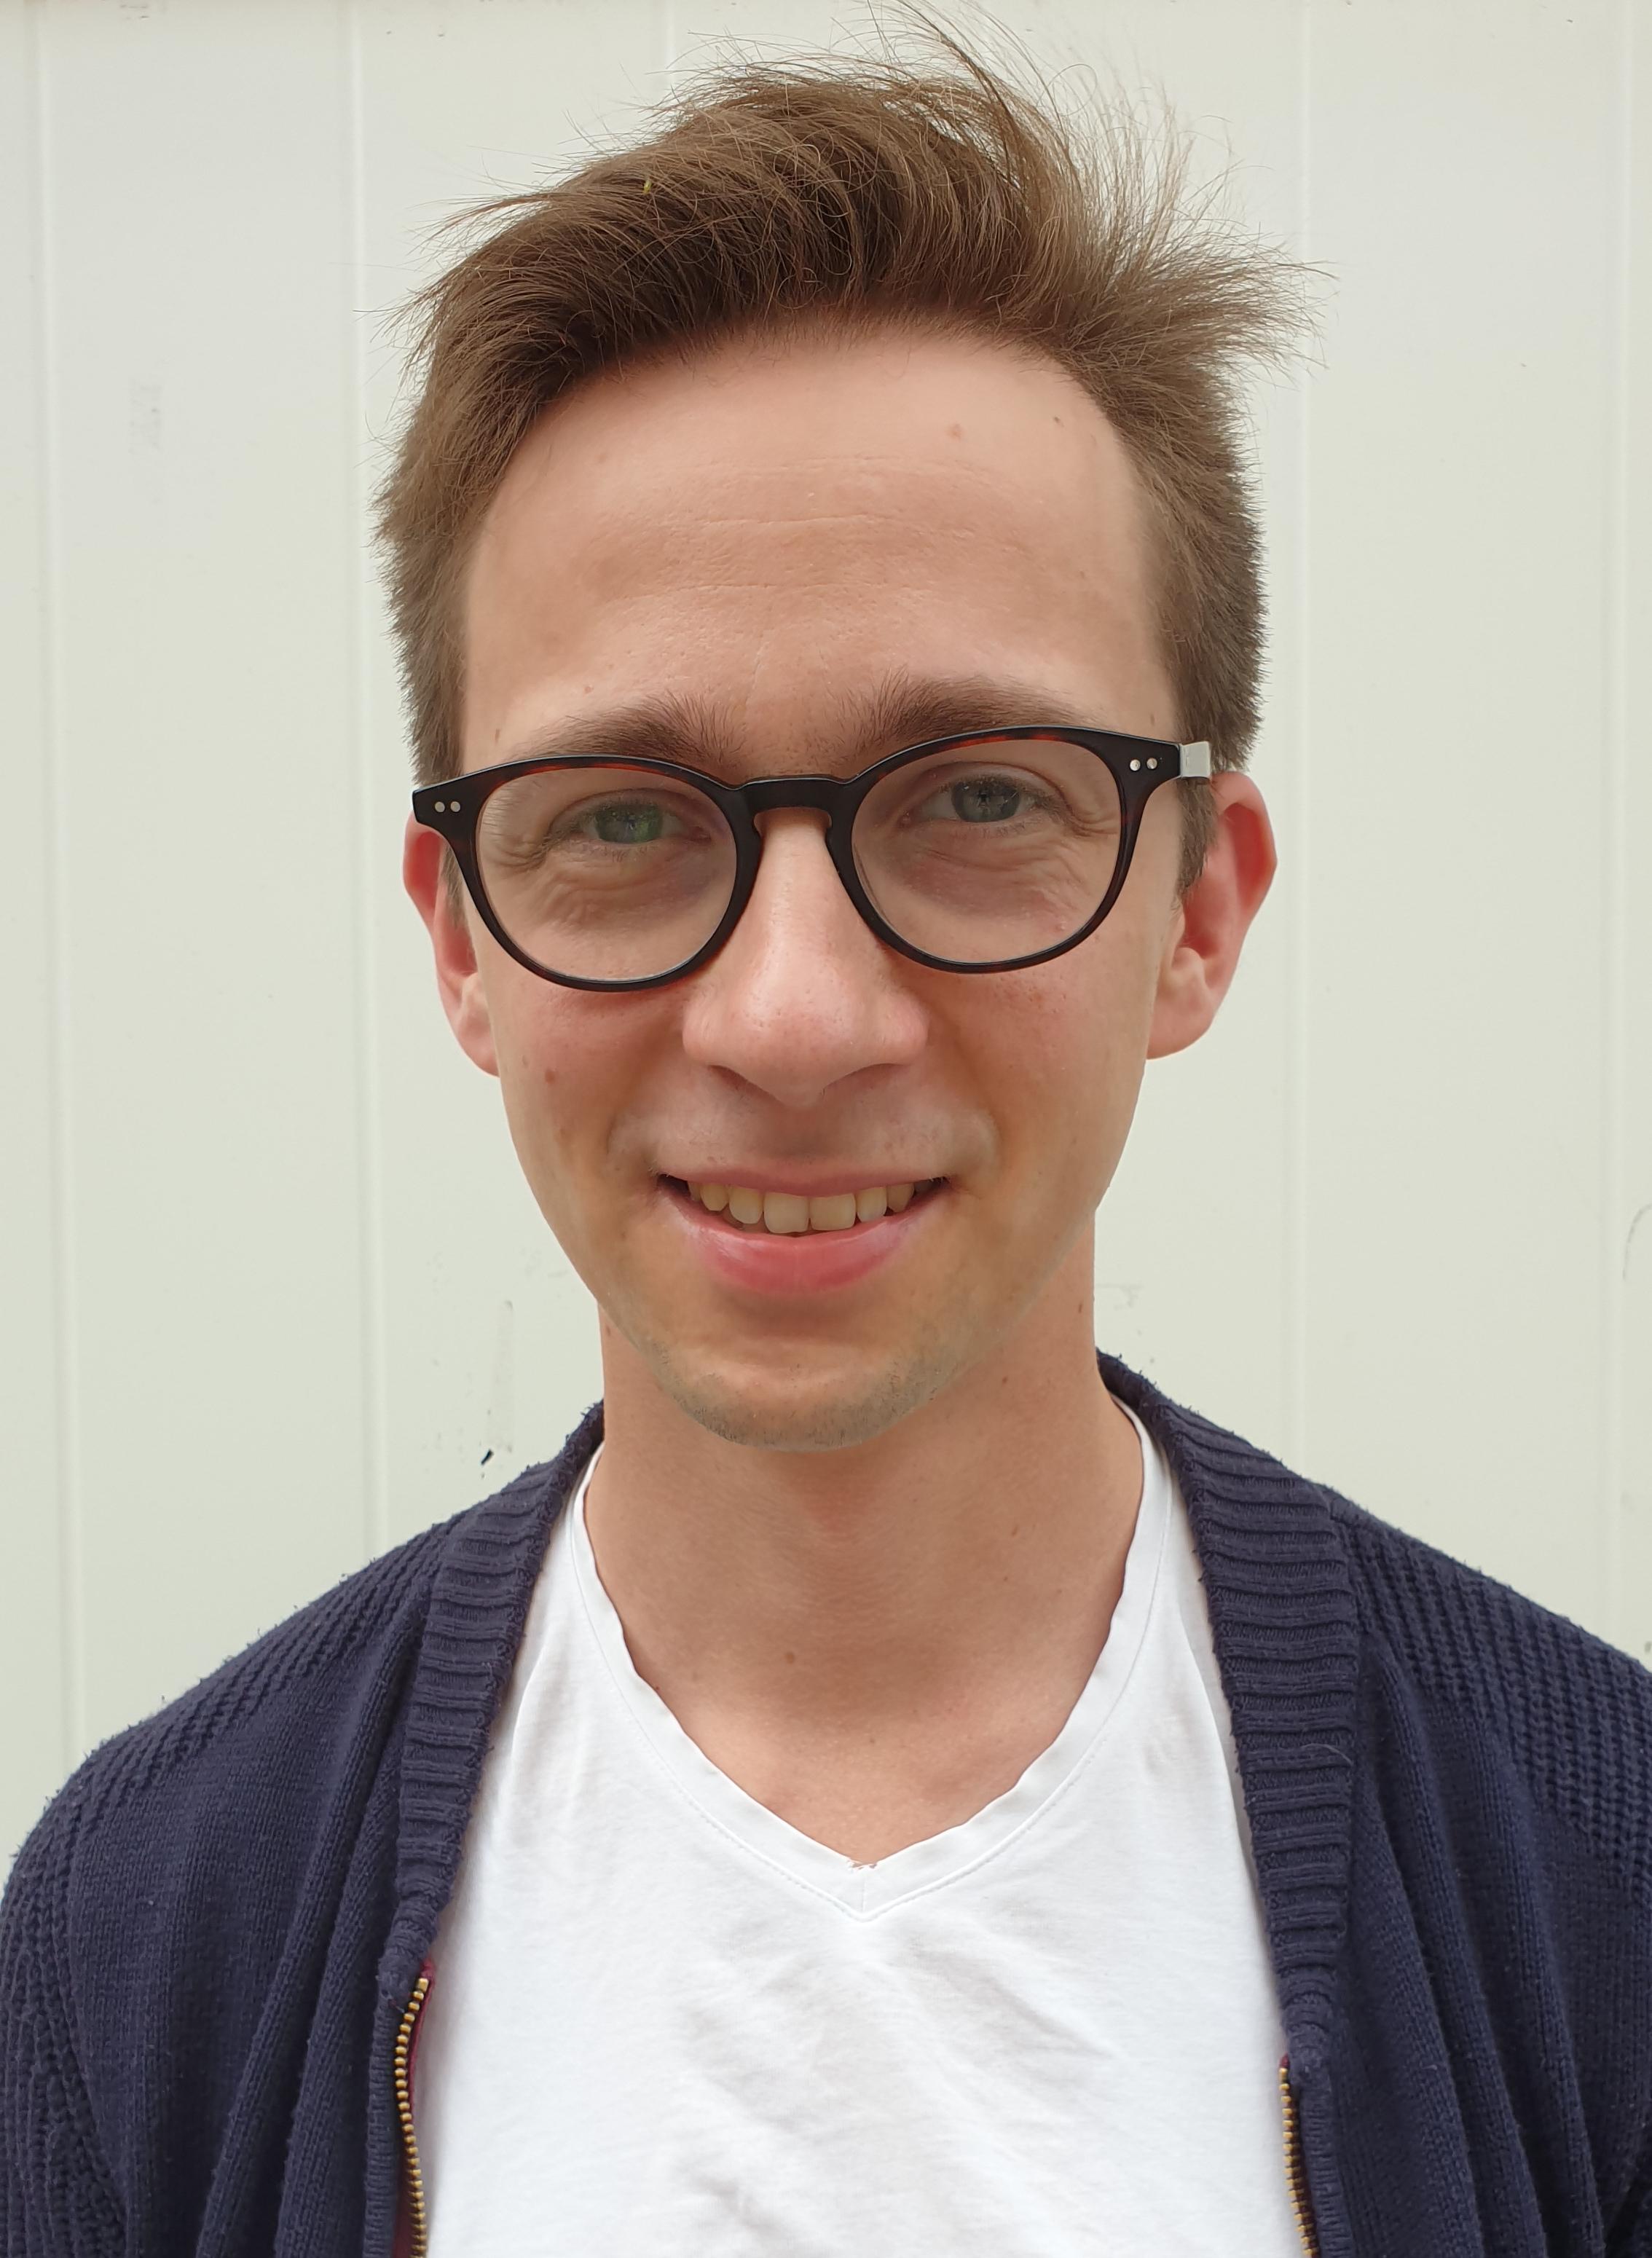 Adam Viklund